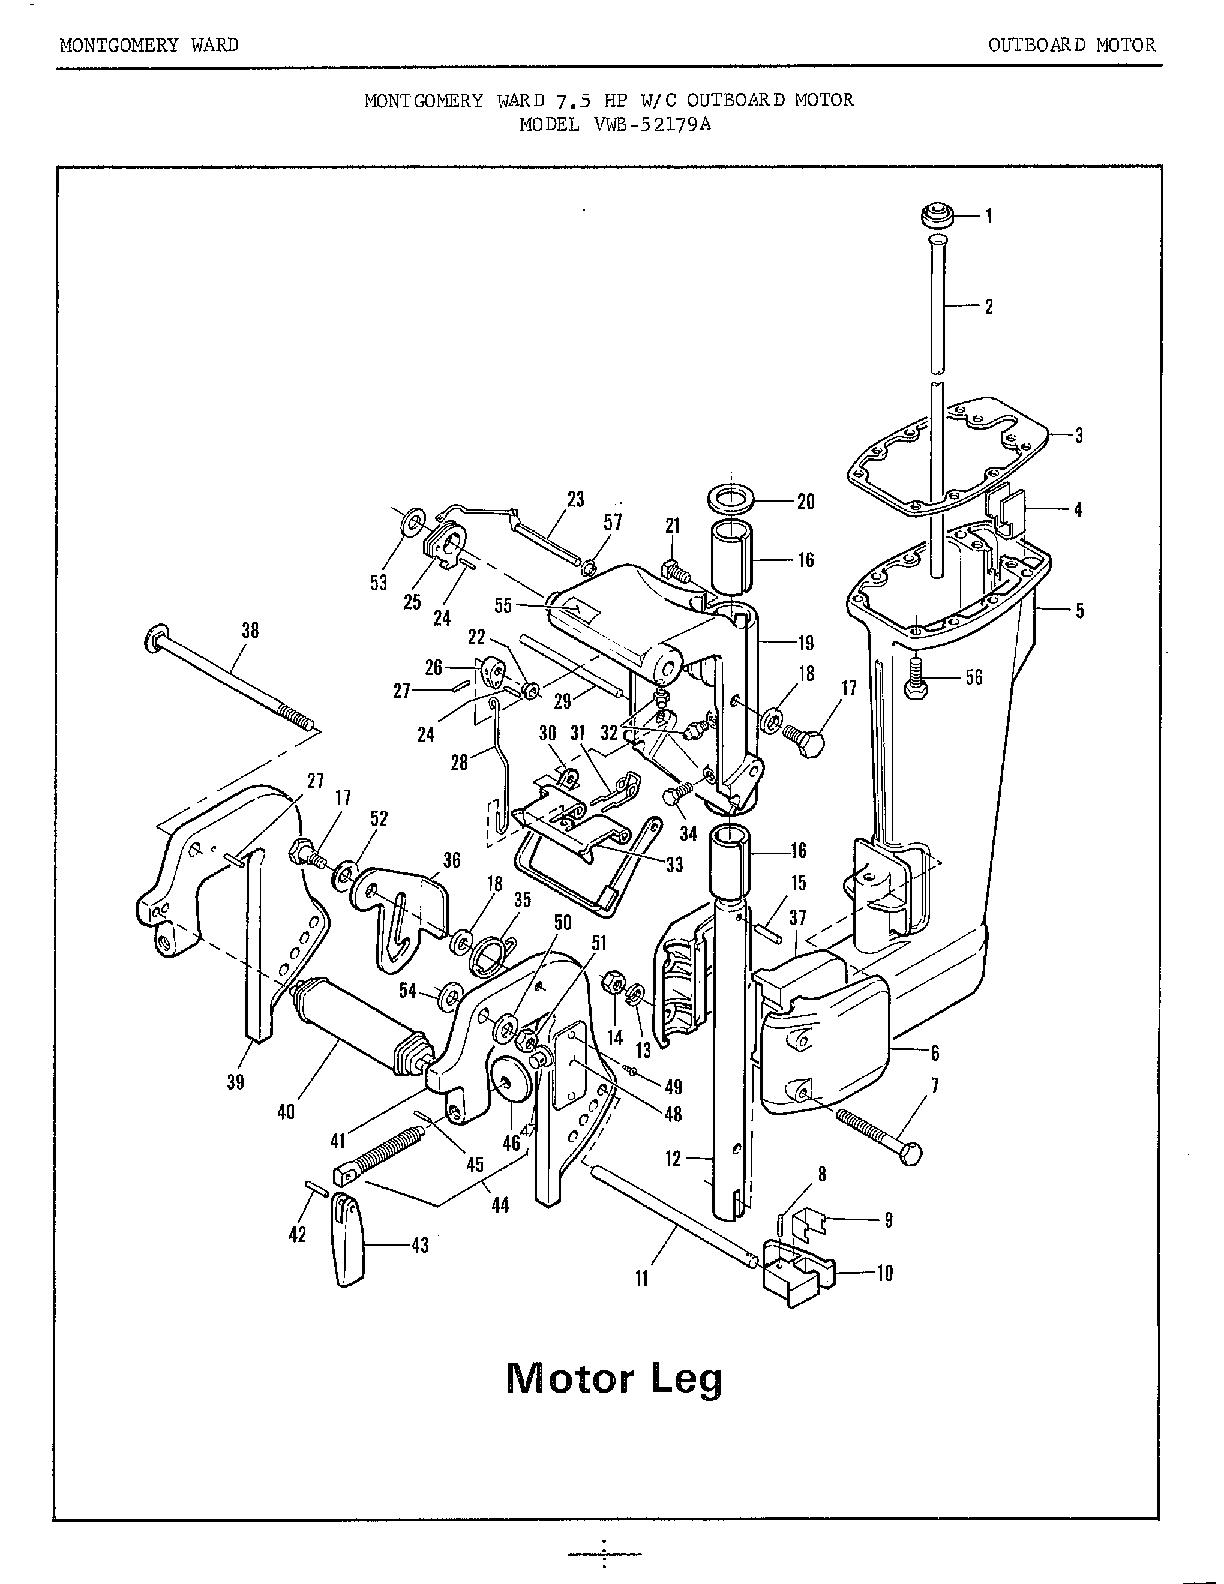 hight resolution of mercury model 52179a motor electric genuine parts motorcycle motor diagram mercury motor diagram